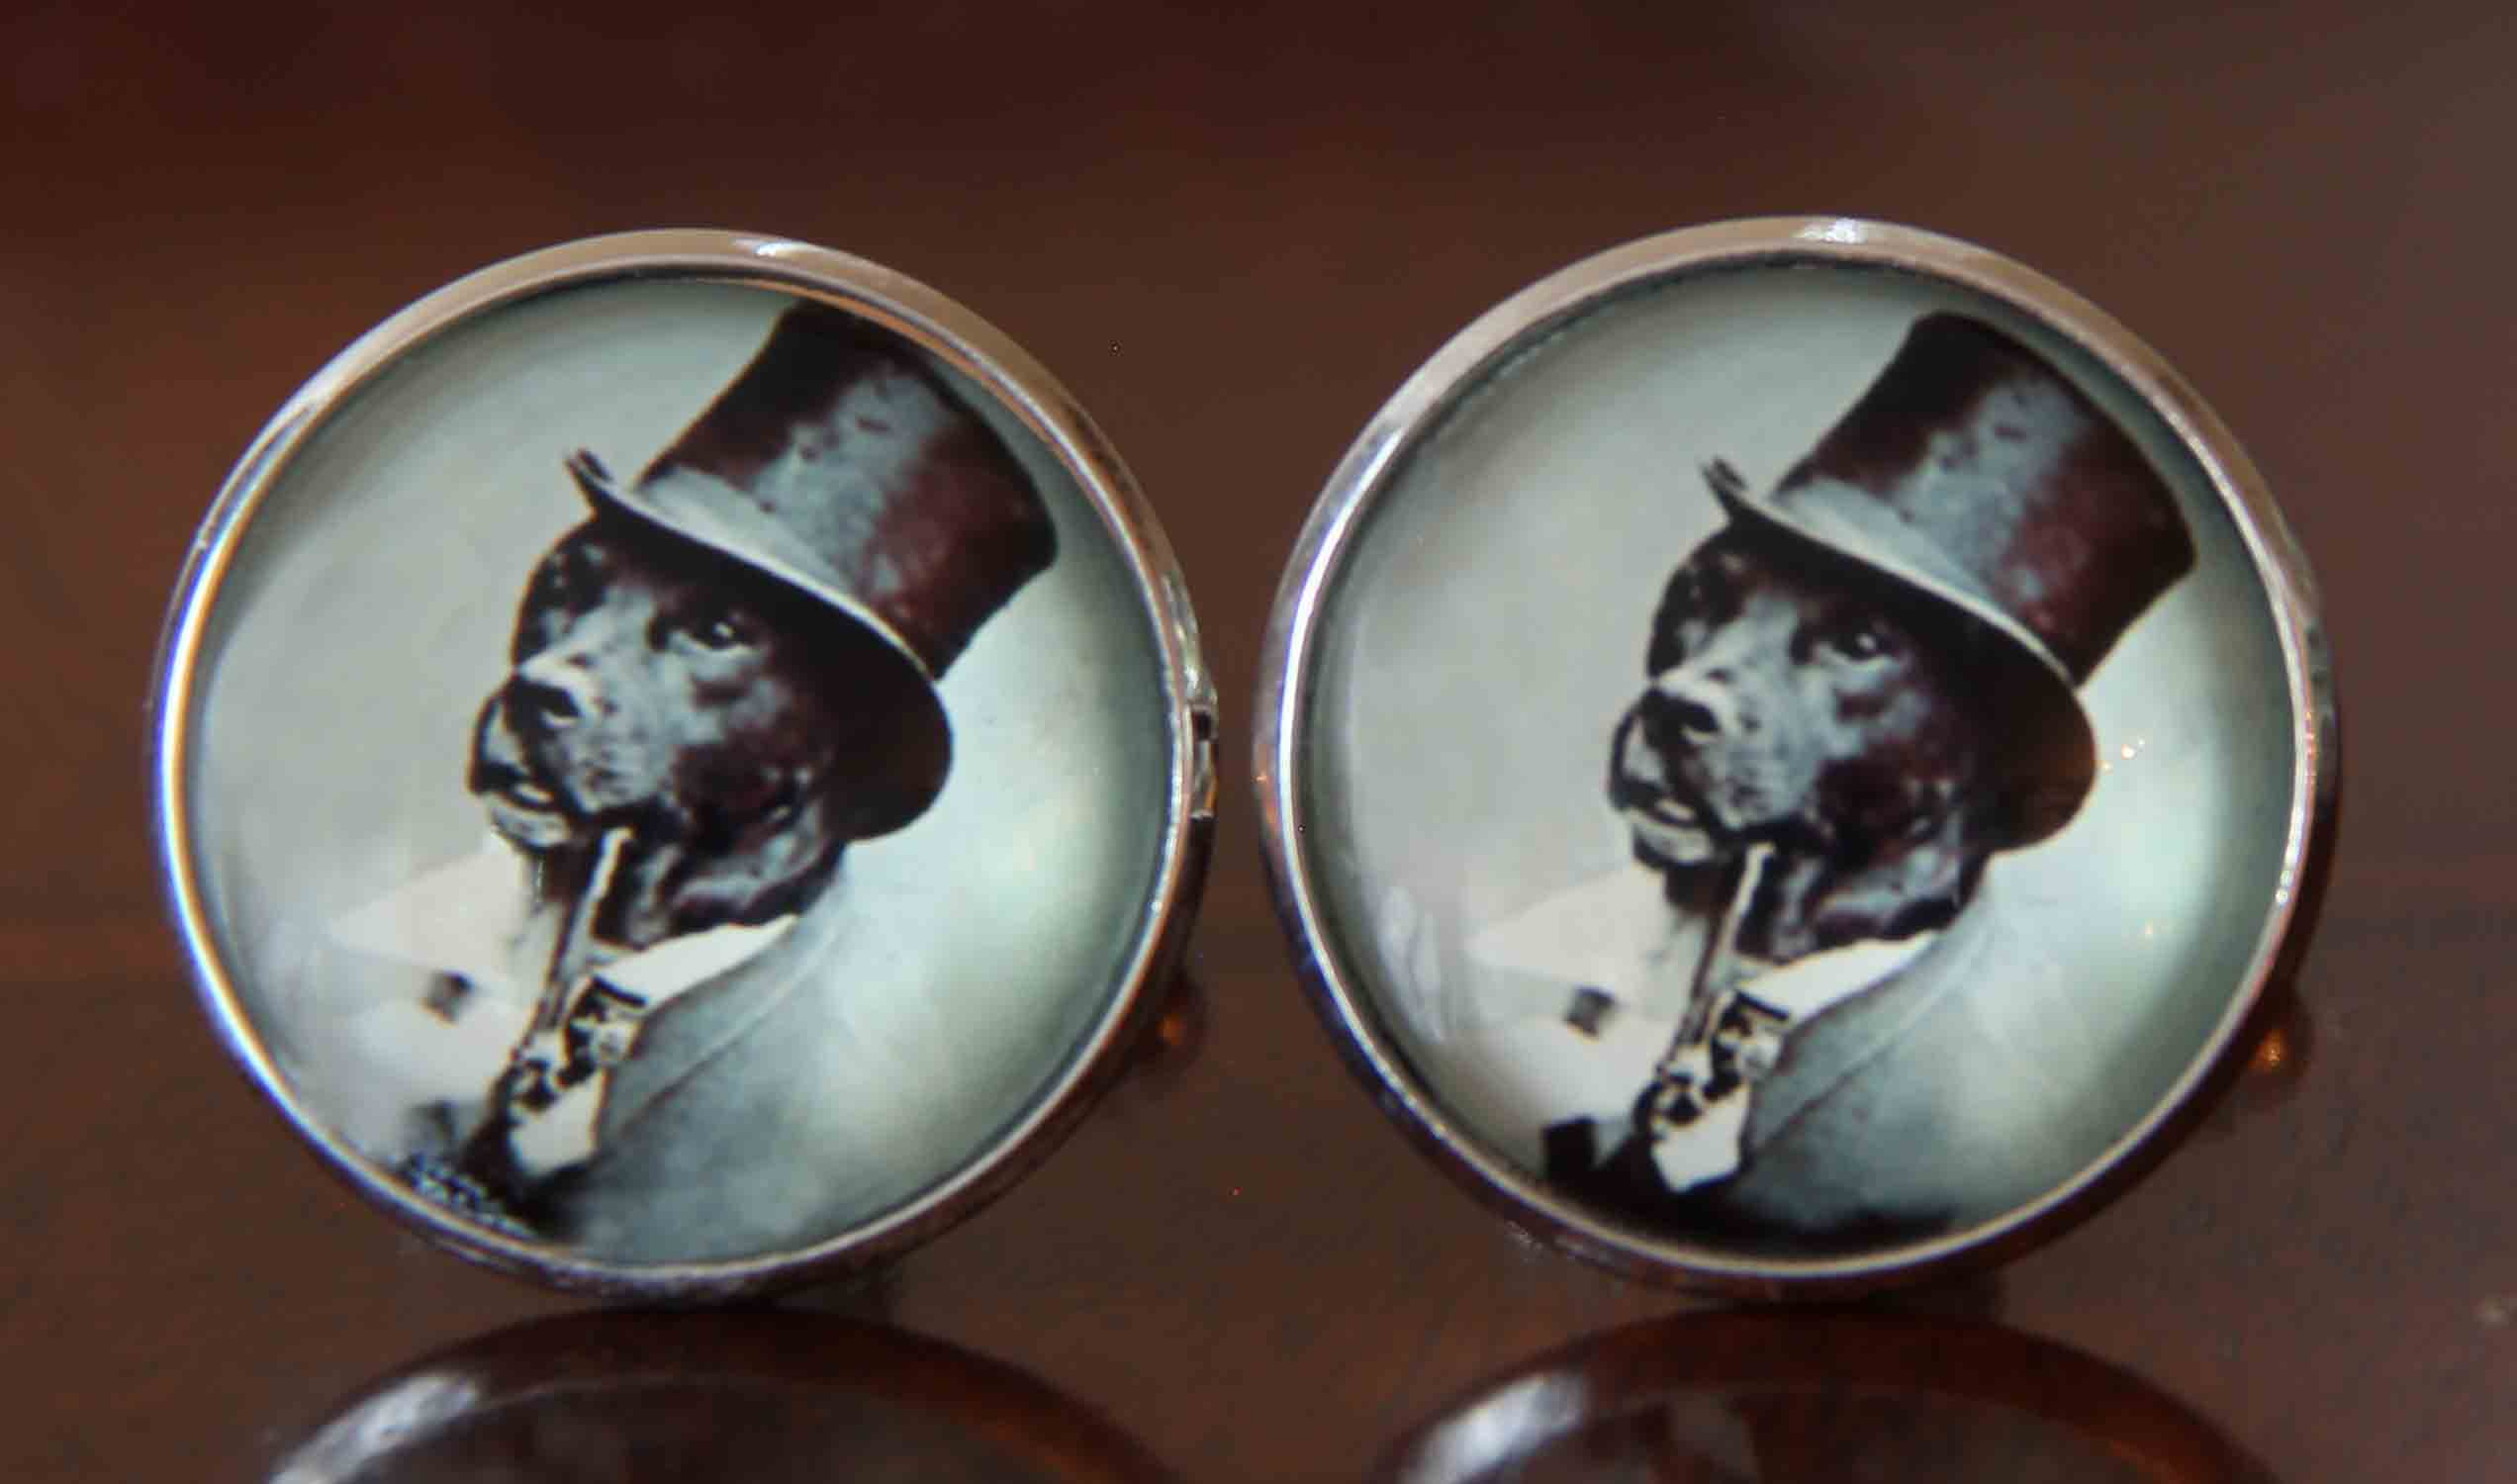 Gascoigne Dog in Top Hat Novelty Cufflinks Silver Metal Alloy Men's